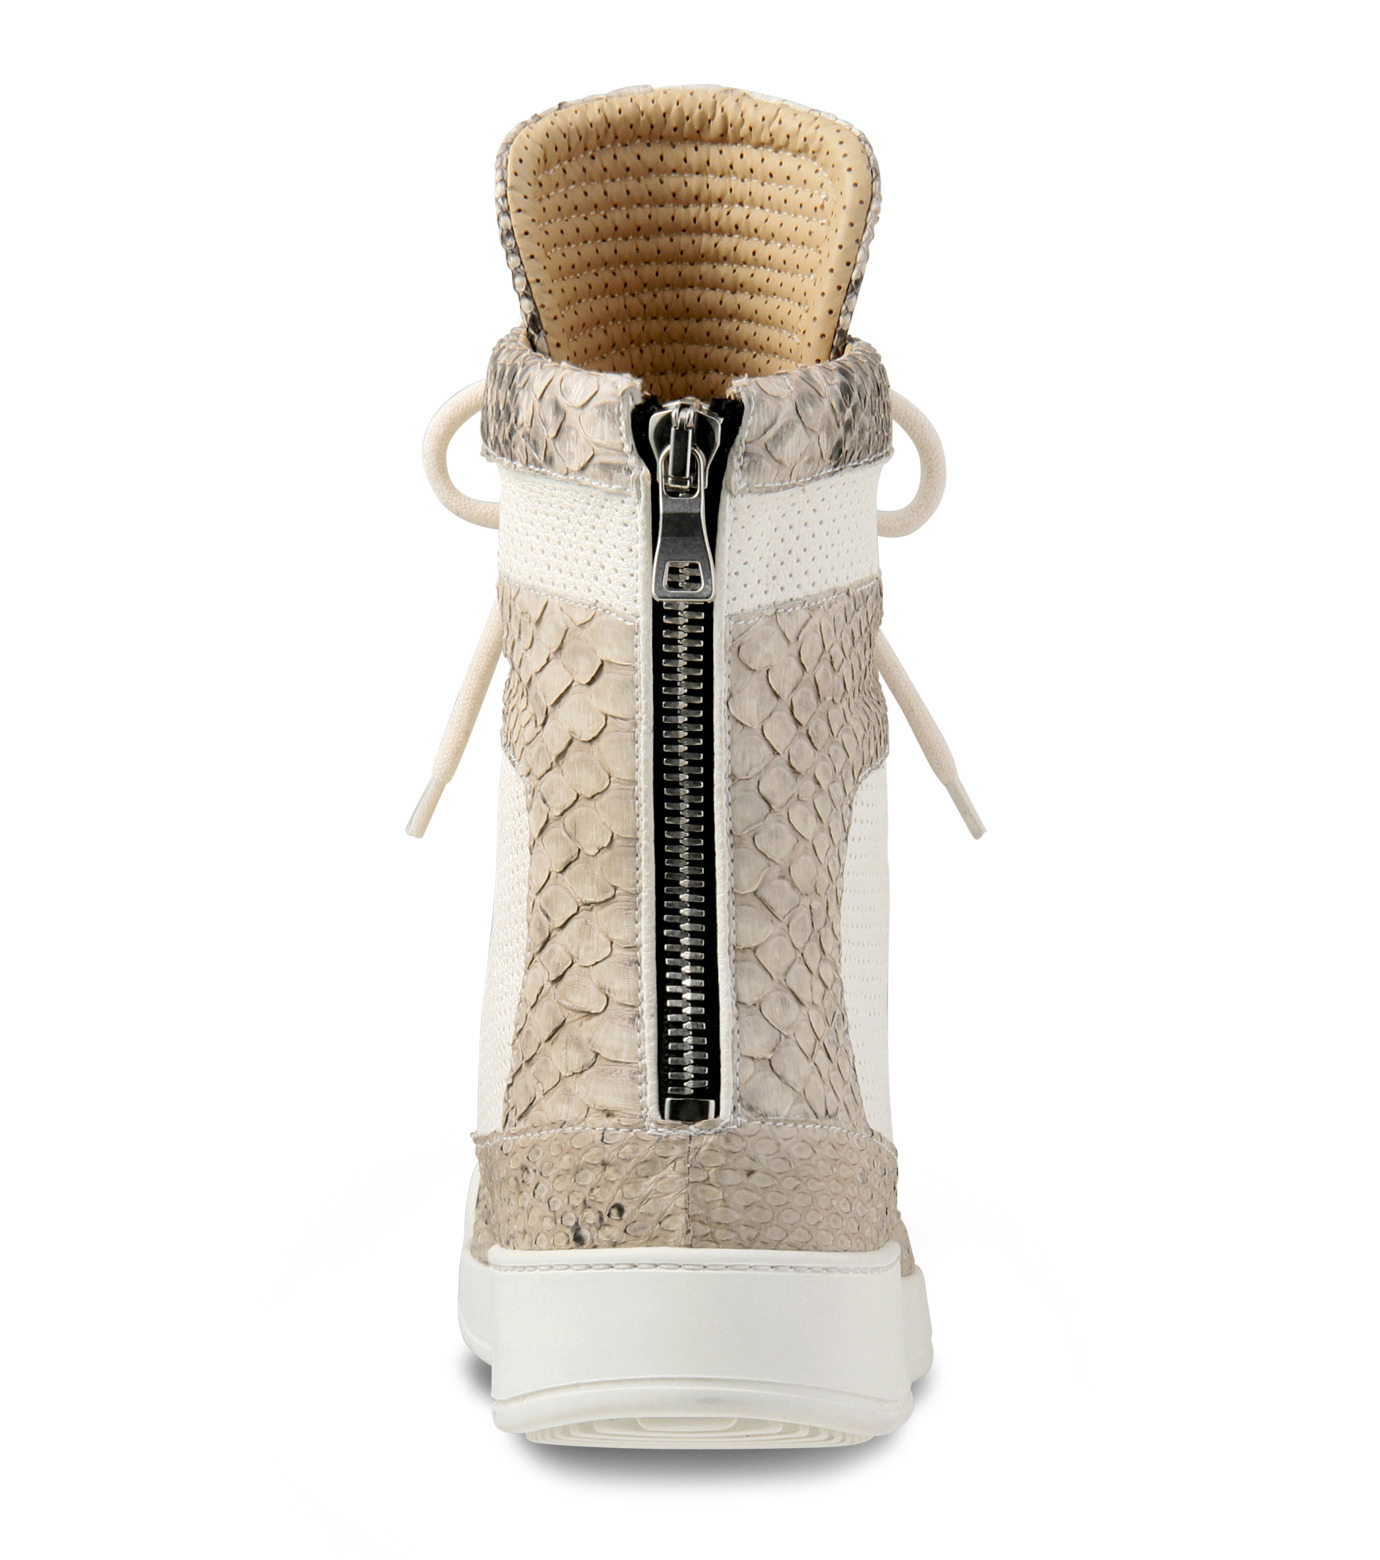 Balmain(バルマン)のHi cut sneaker-WHITE-T306-C189-4 拡大詳細画像3